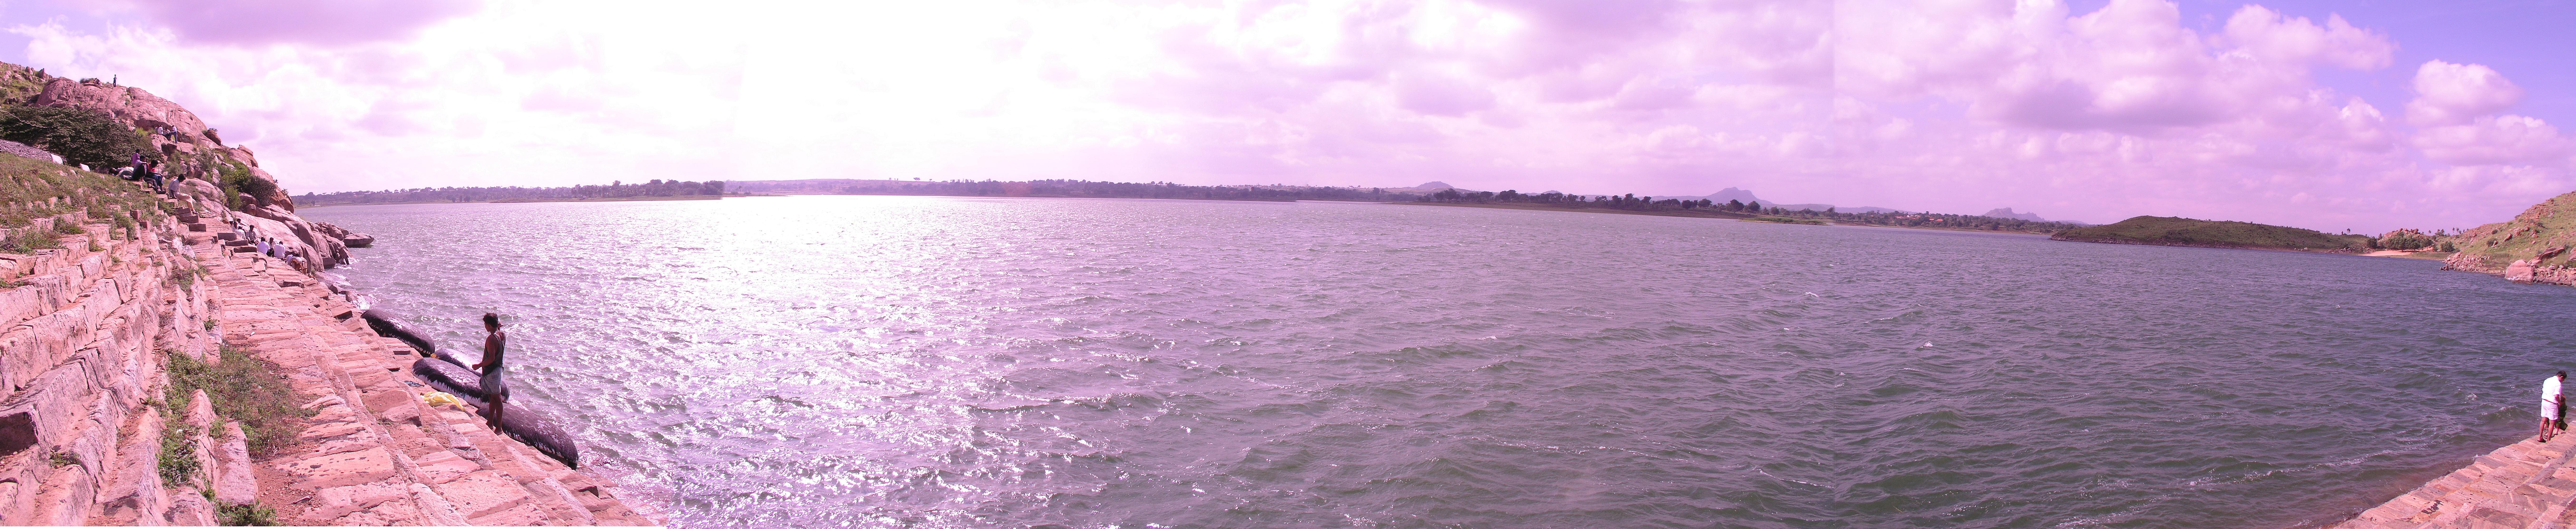 thoNdanur lake